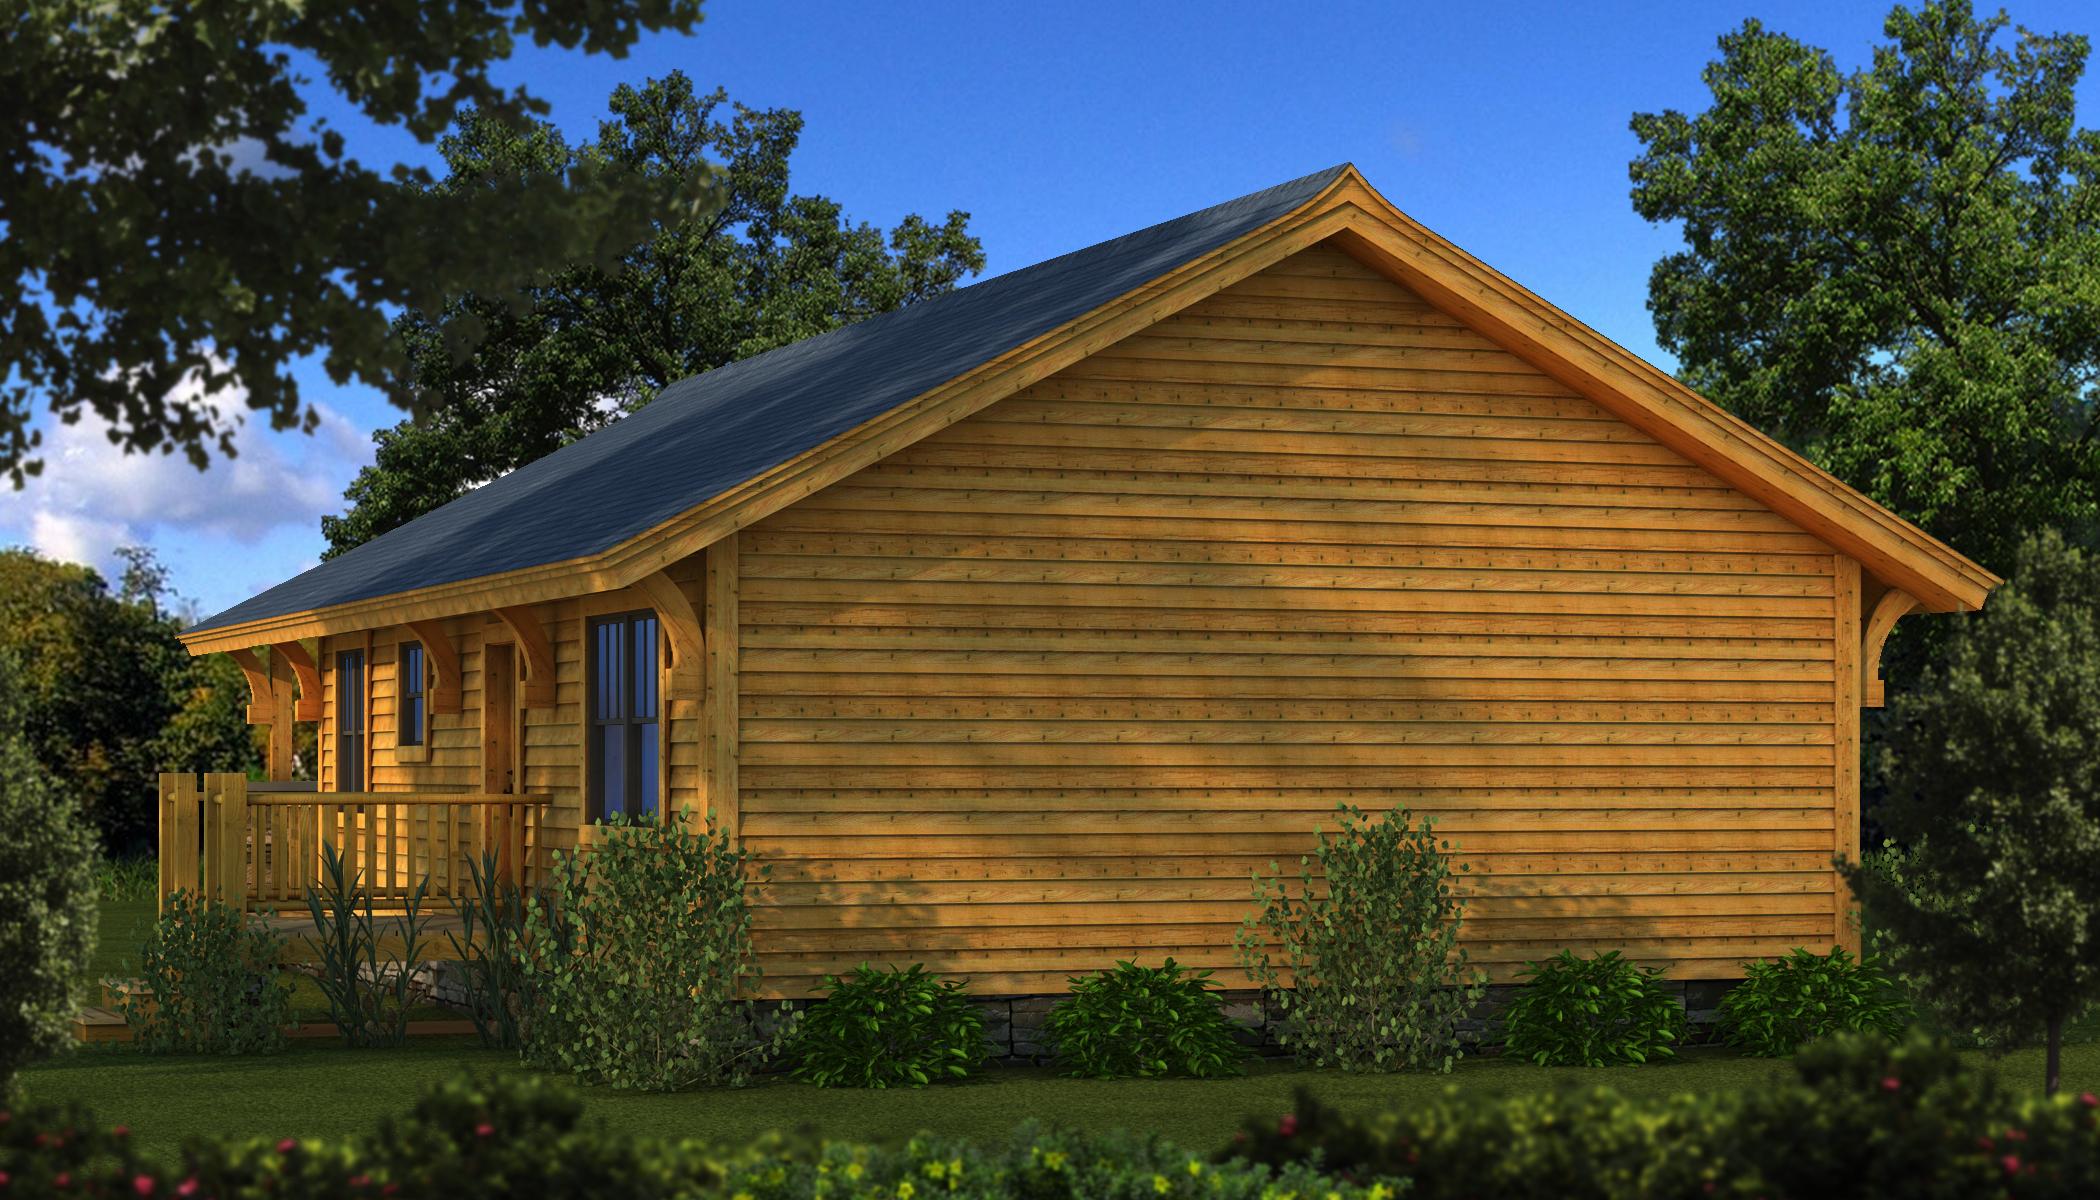 Log Cabin Bungalow : Bungalow plans information southland log homes